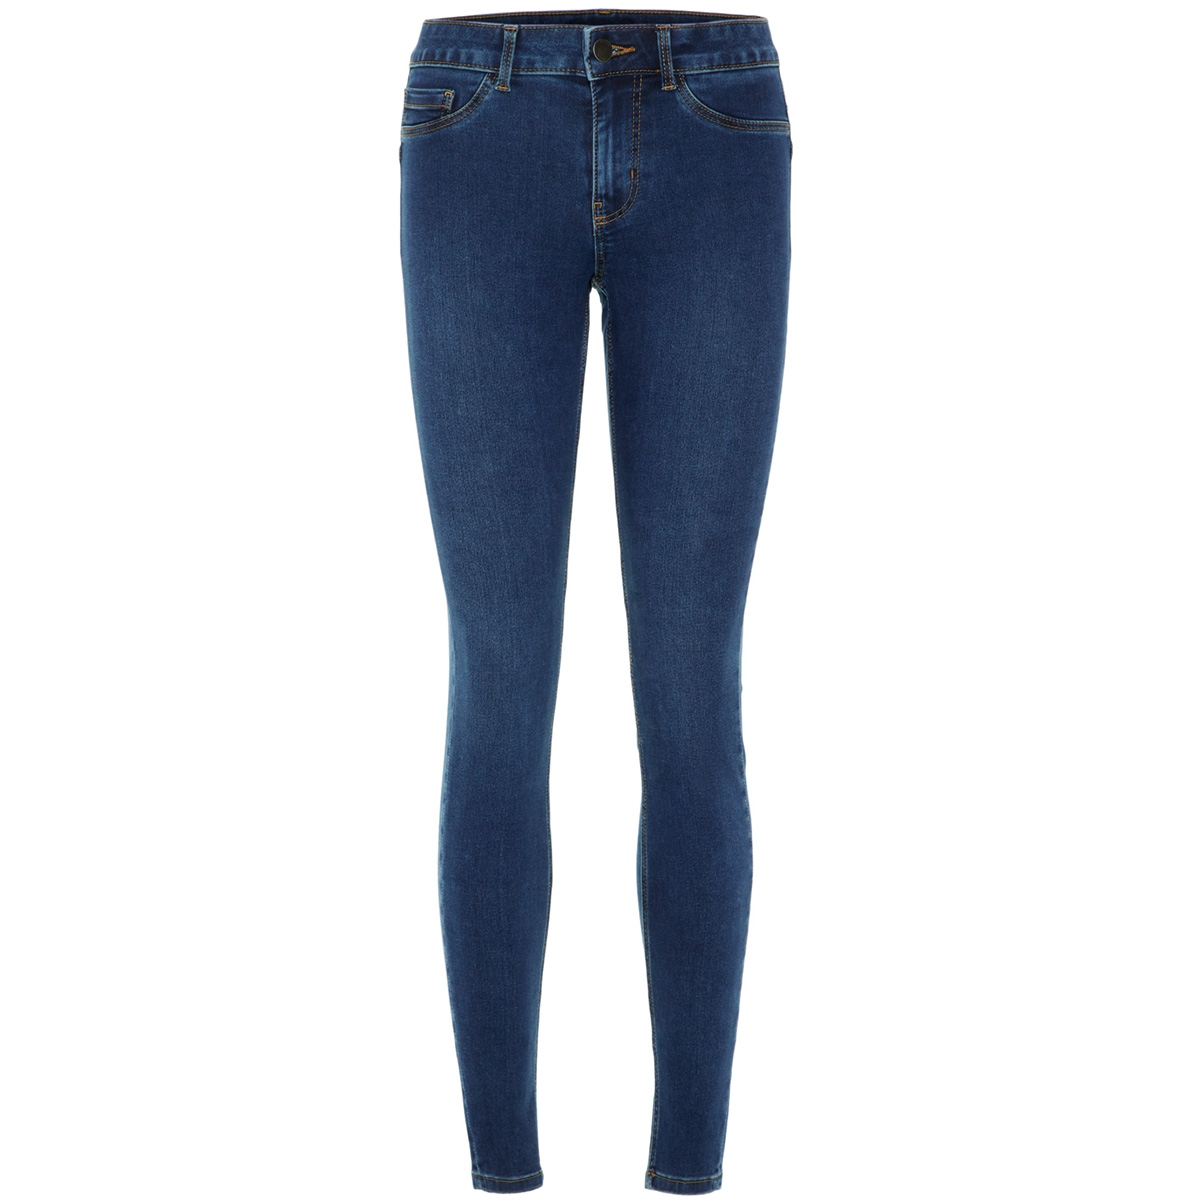 pcshape-up sage mw jegging mb212-vi 17094537 pieces jeans medium blue denim